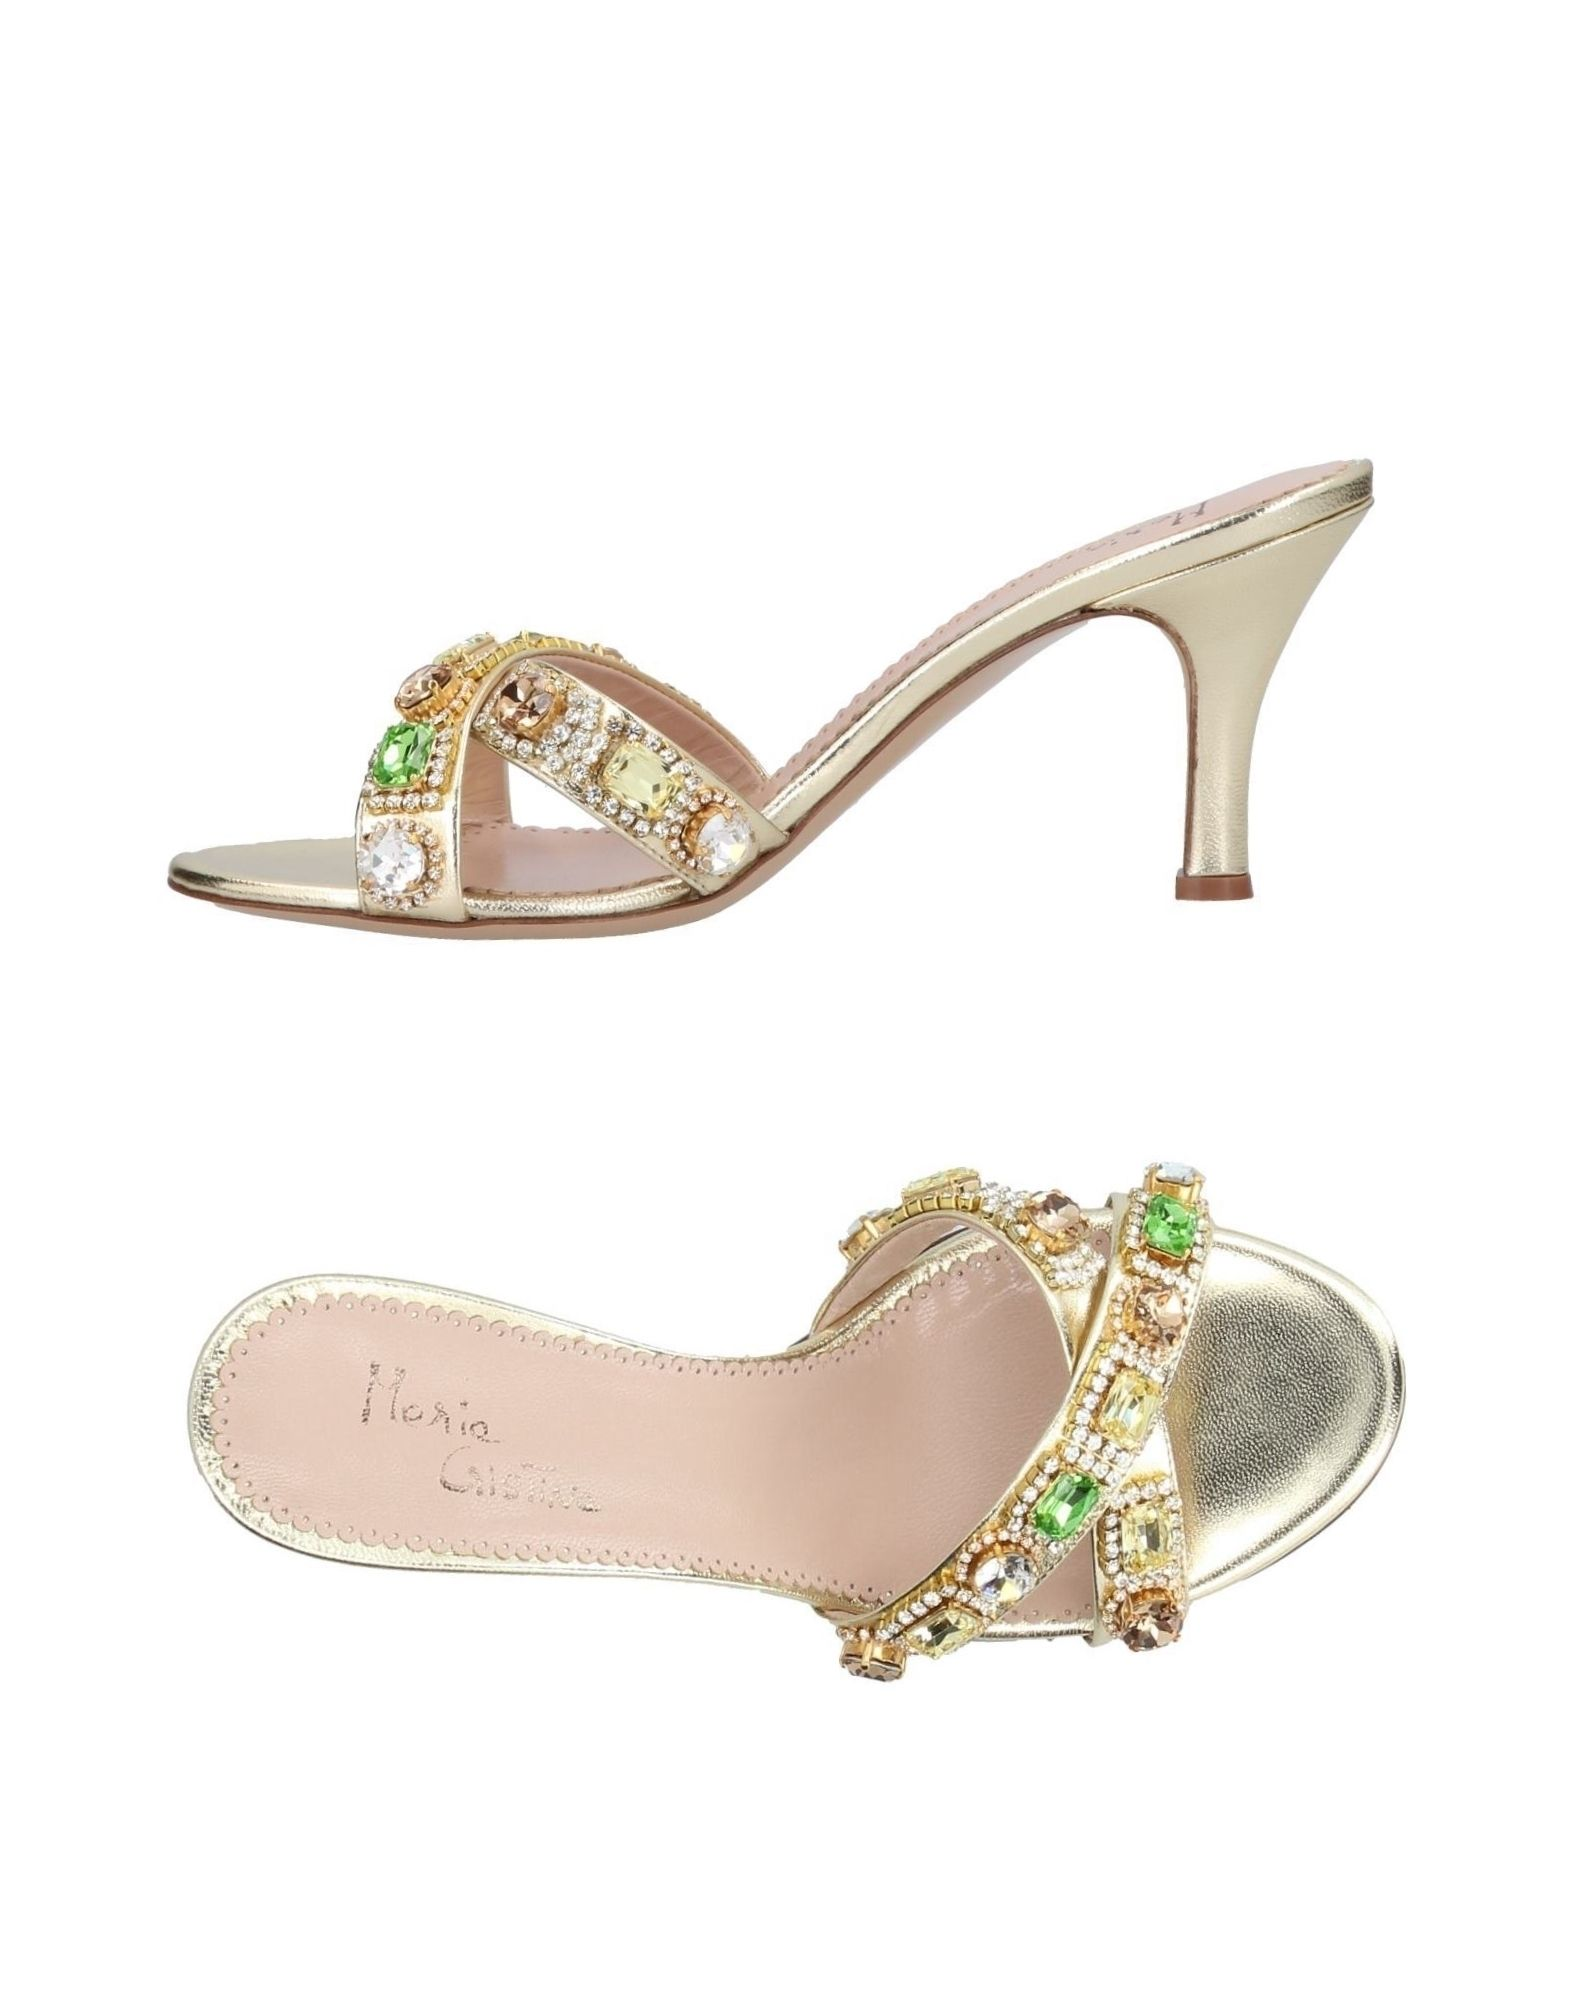 Maria Cristina Sandalen Damen  11379510SM Gute Qualität beliebte Schuhe